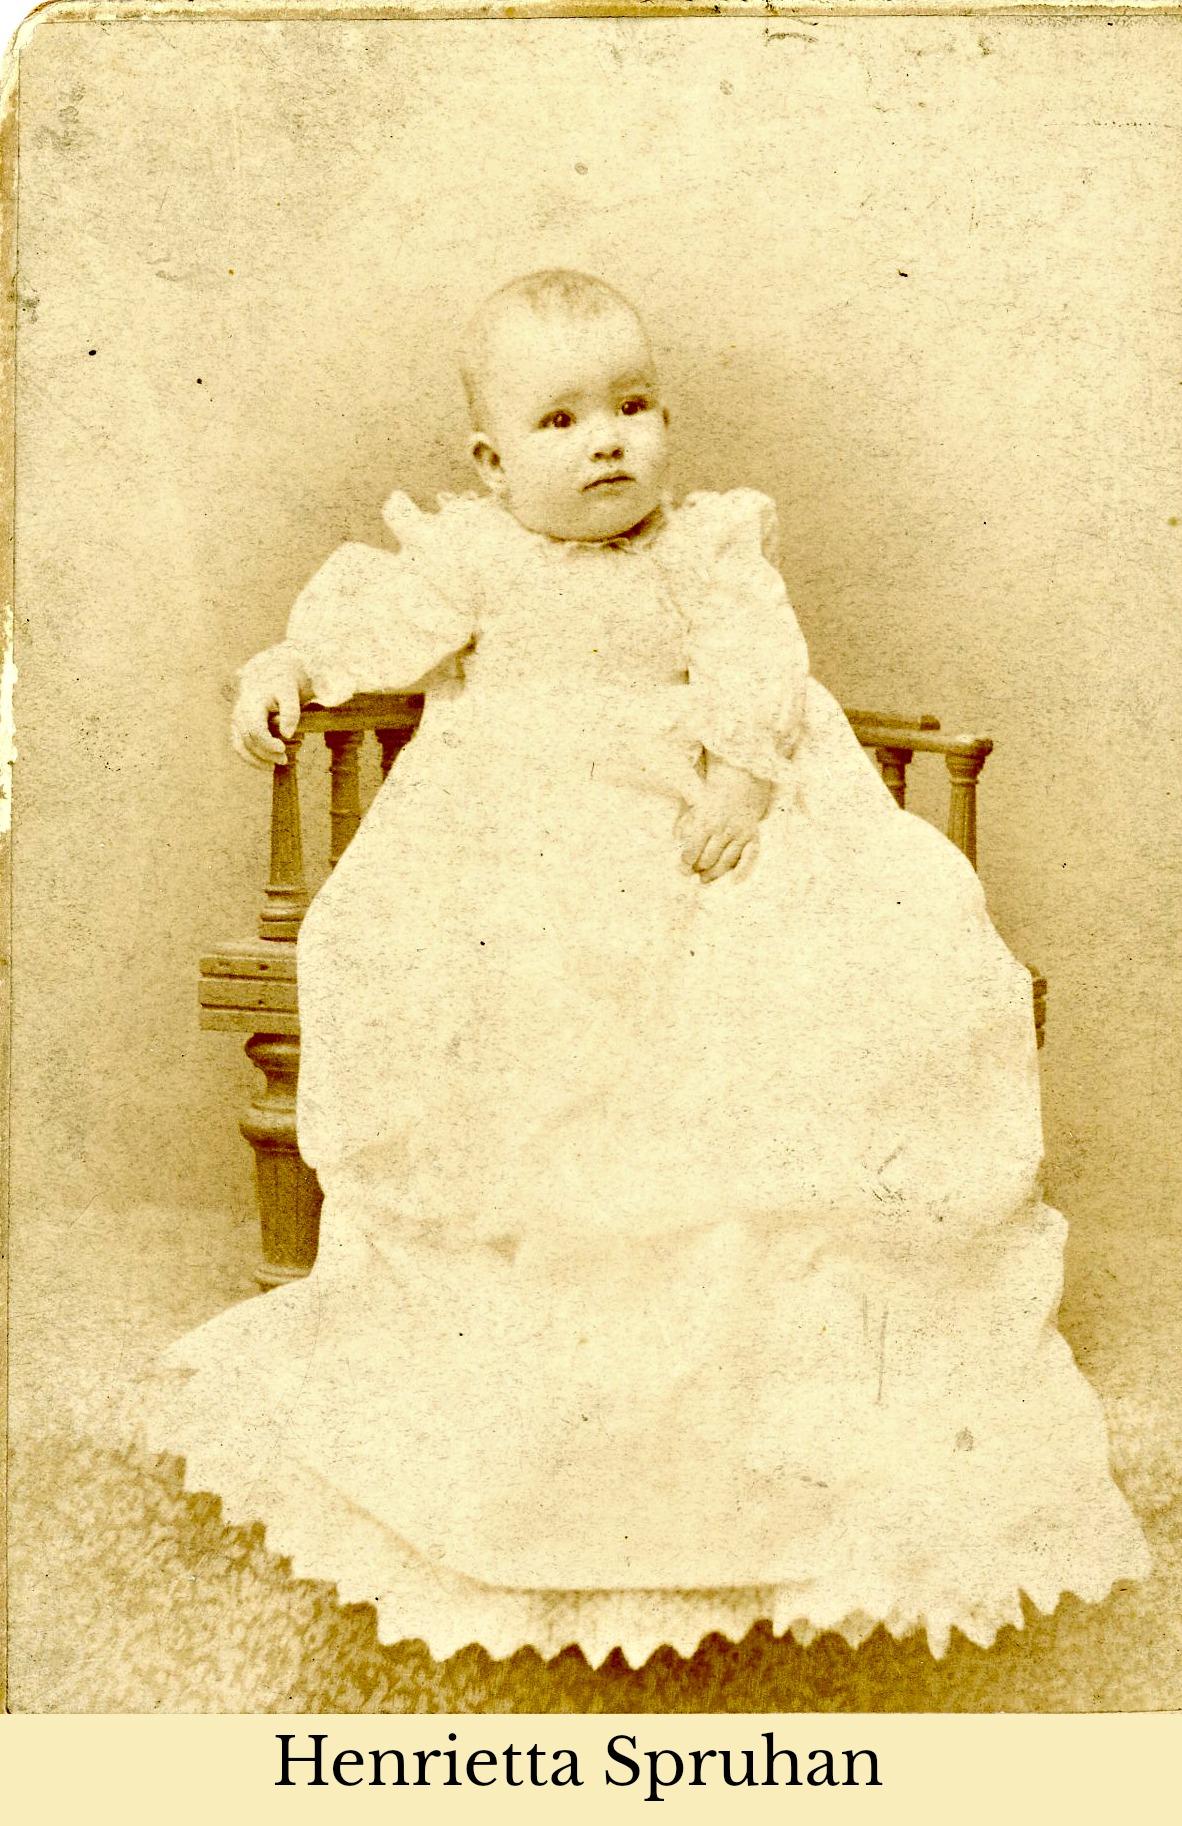 Henrietta Spruhan infant